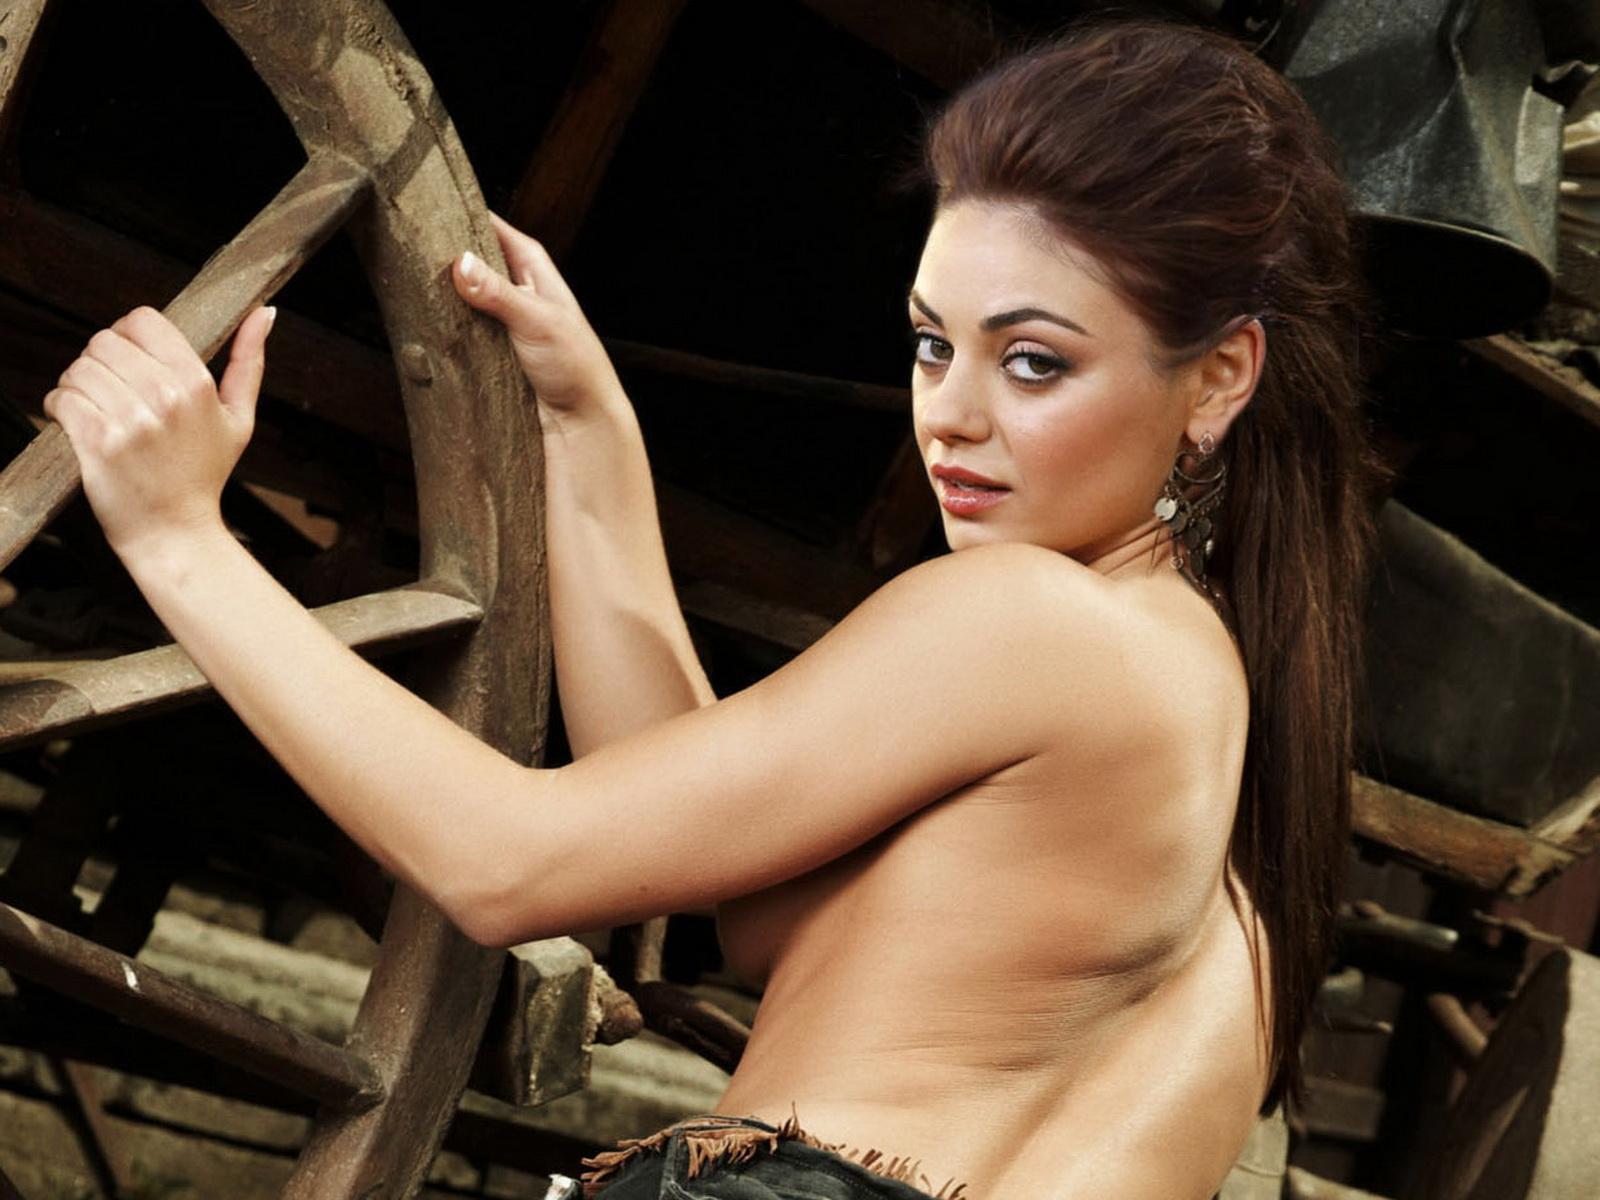 Nude Naked Celebrity Star Actress Model Singer Mila Kunis Spread